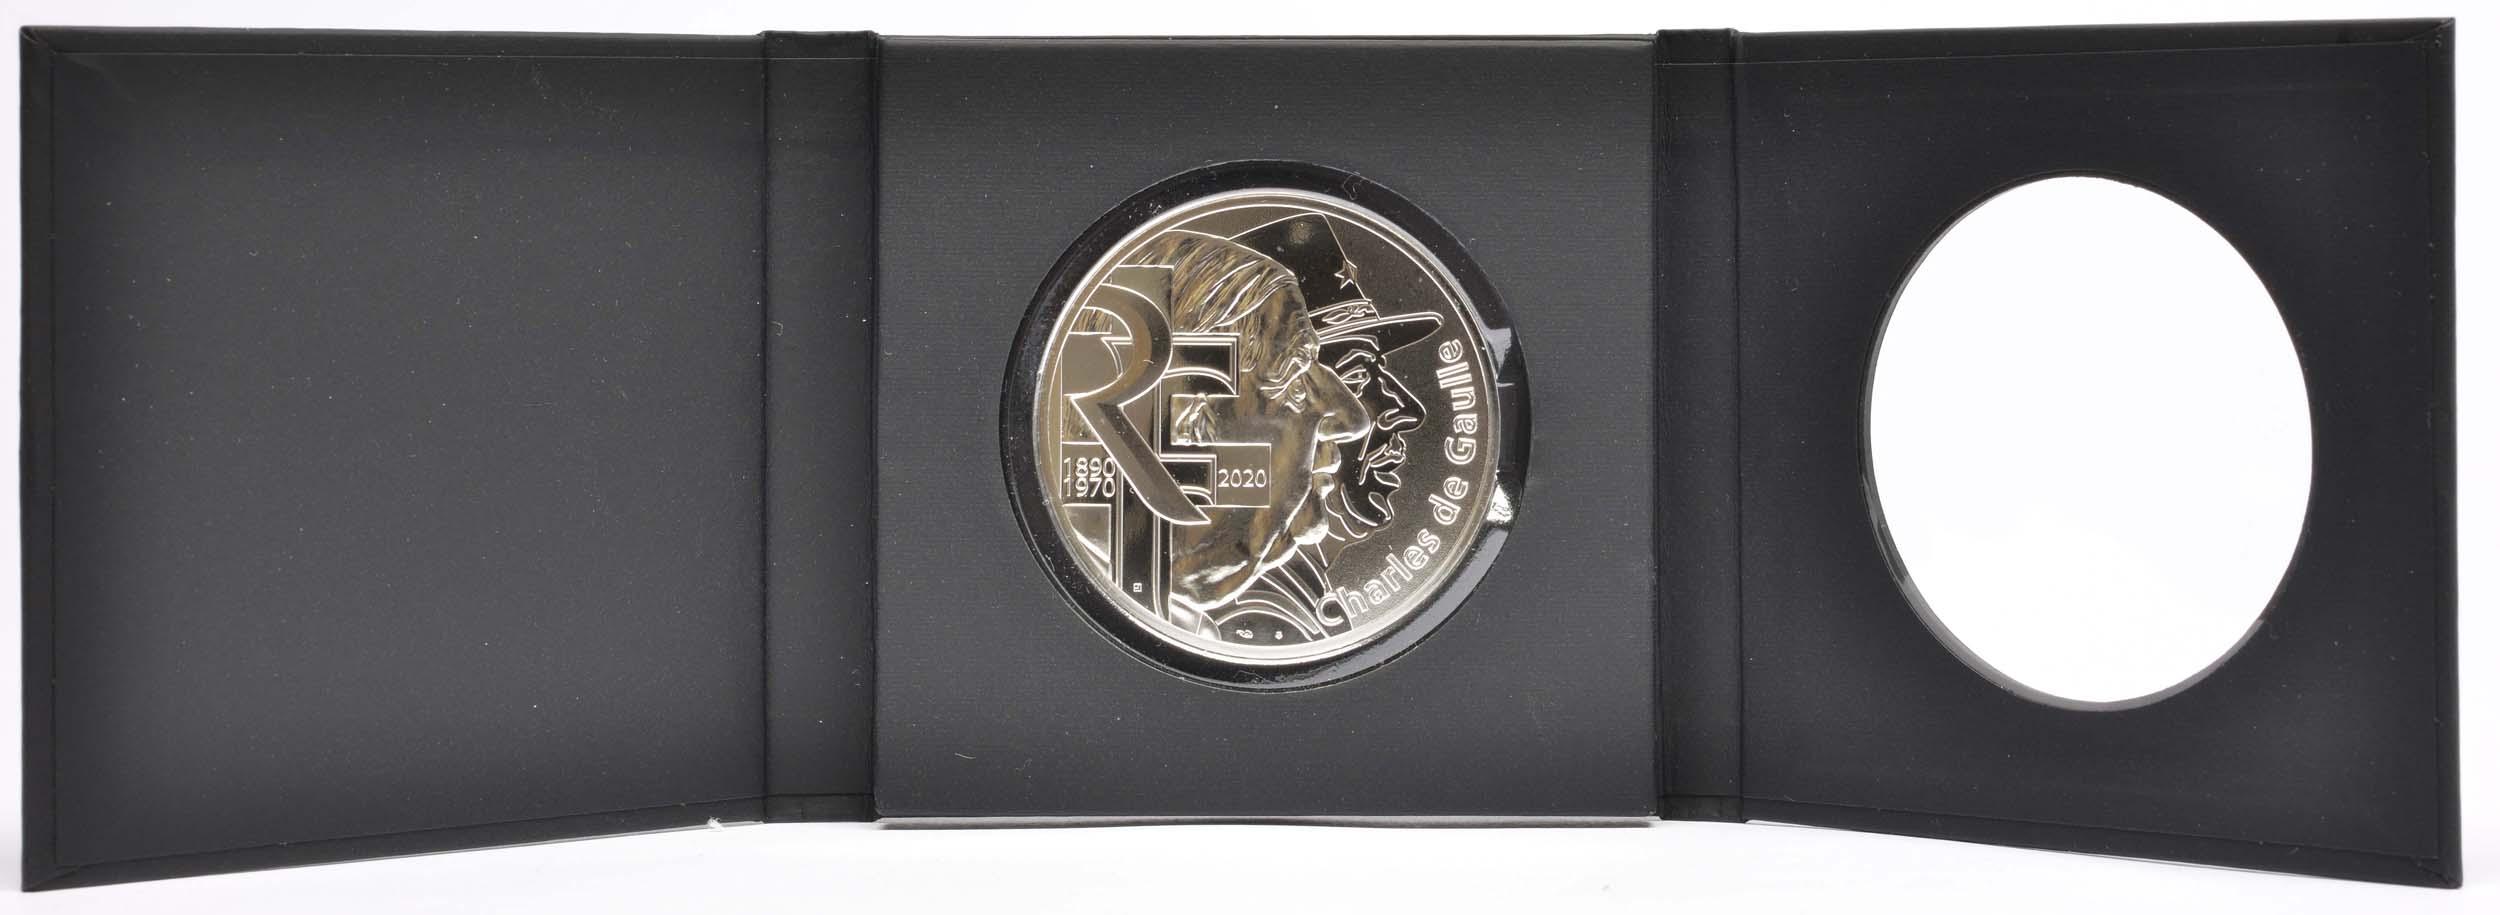 Lieferumfang:Frankreich : 100 Euro Charles de Gaulle  2020 Stgl.